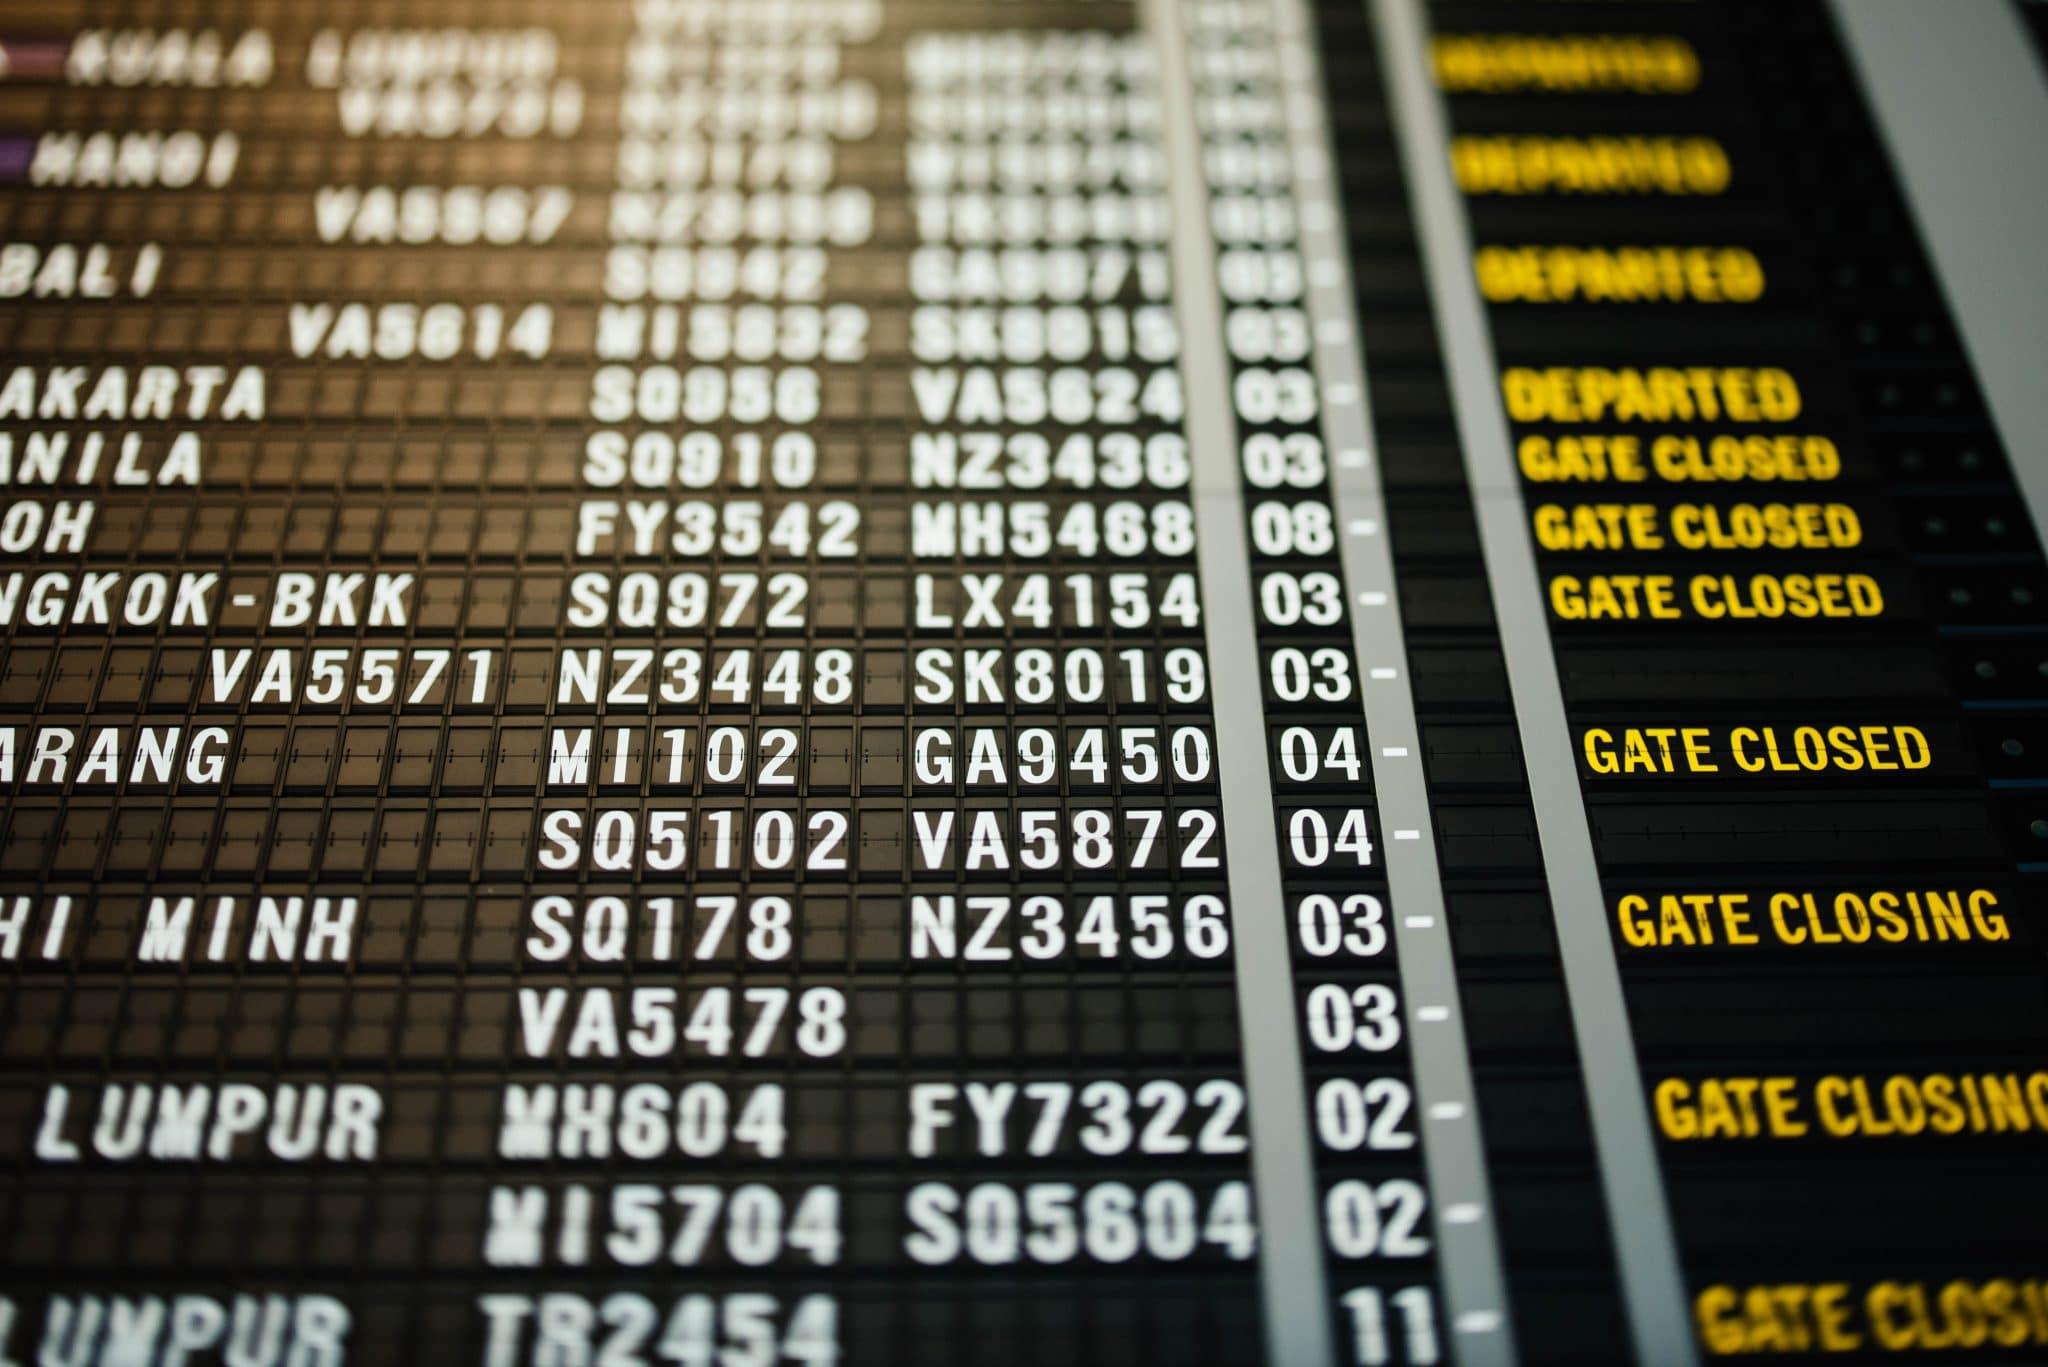 BringBackTravel: Ξεκίνα από τώρα να σχεδιάζεις τα ταξίδια σου